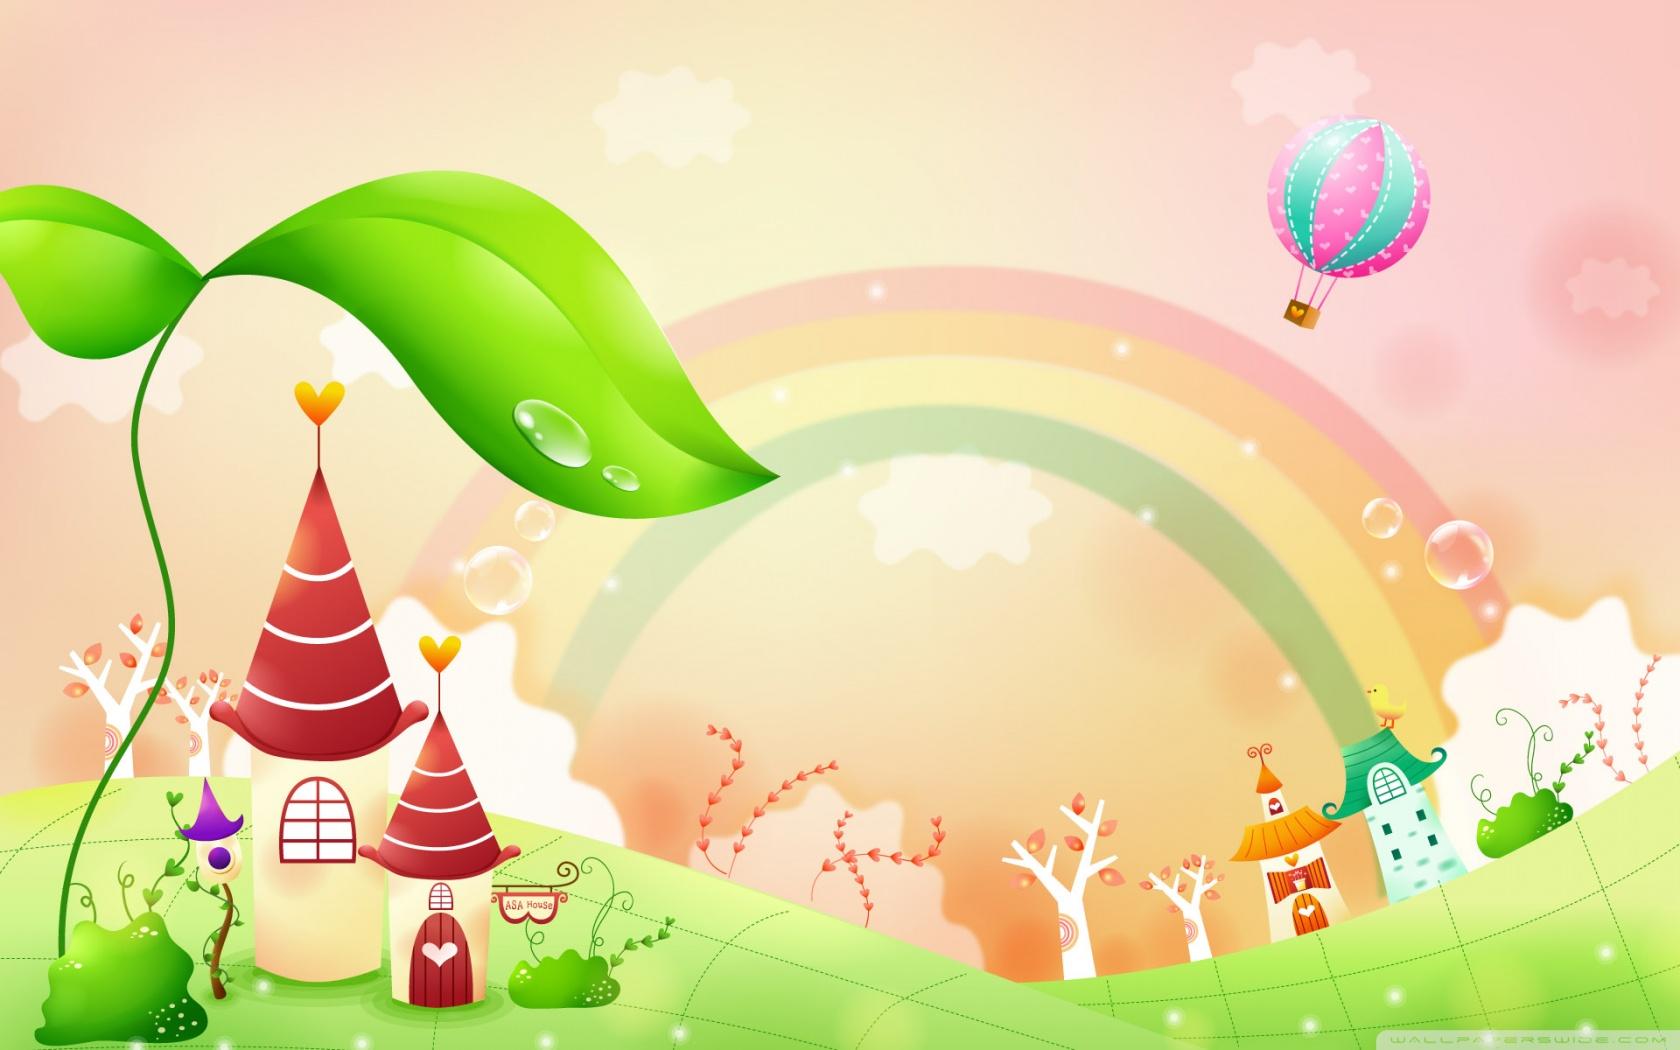 Spring Landscape With Rainbow 1 HD desktop wallpaper : Widescreen.